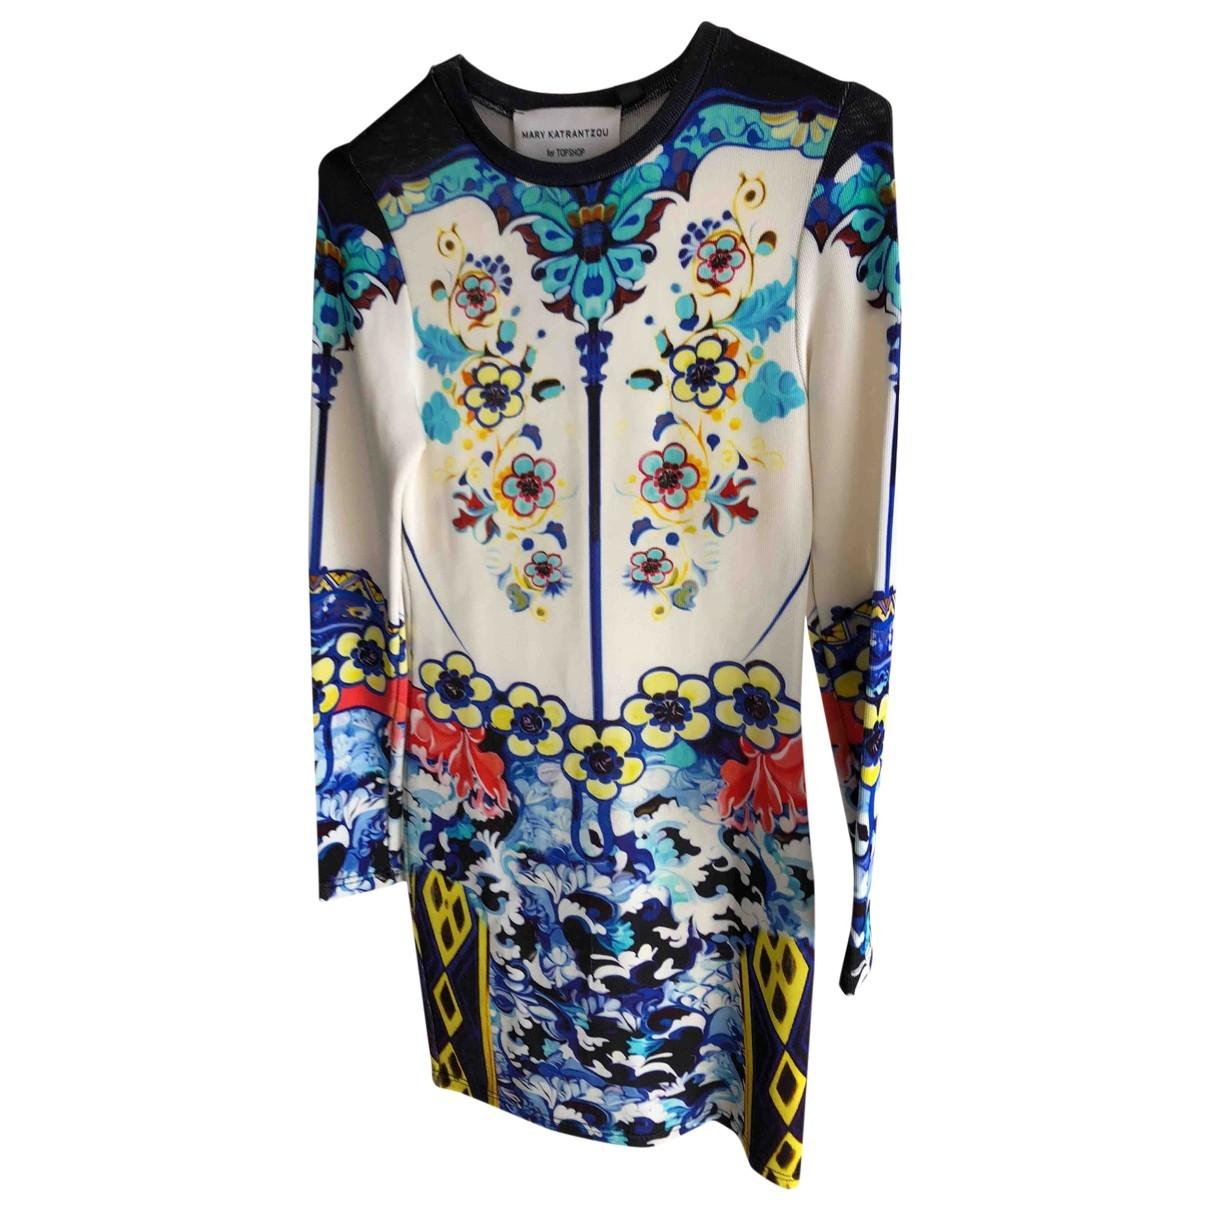 tophop \N Multicolour dress for Women M International